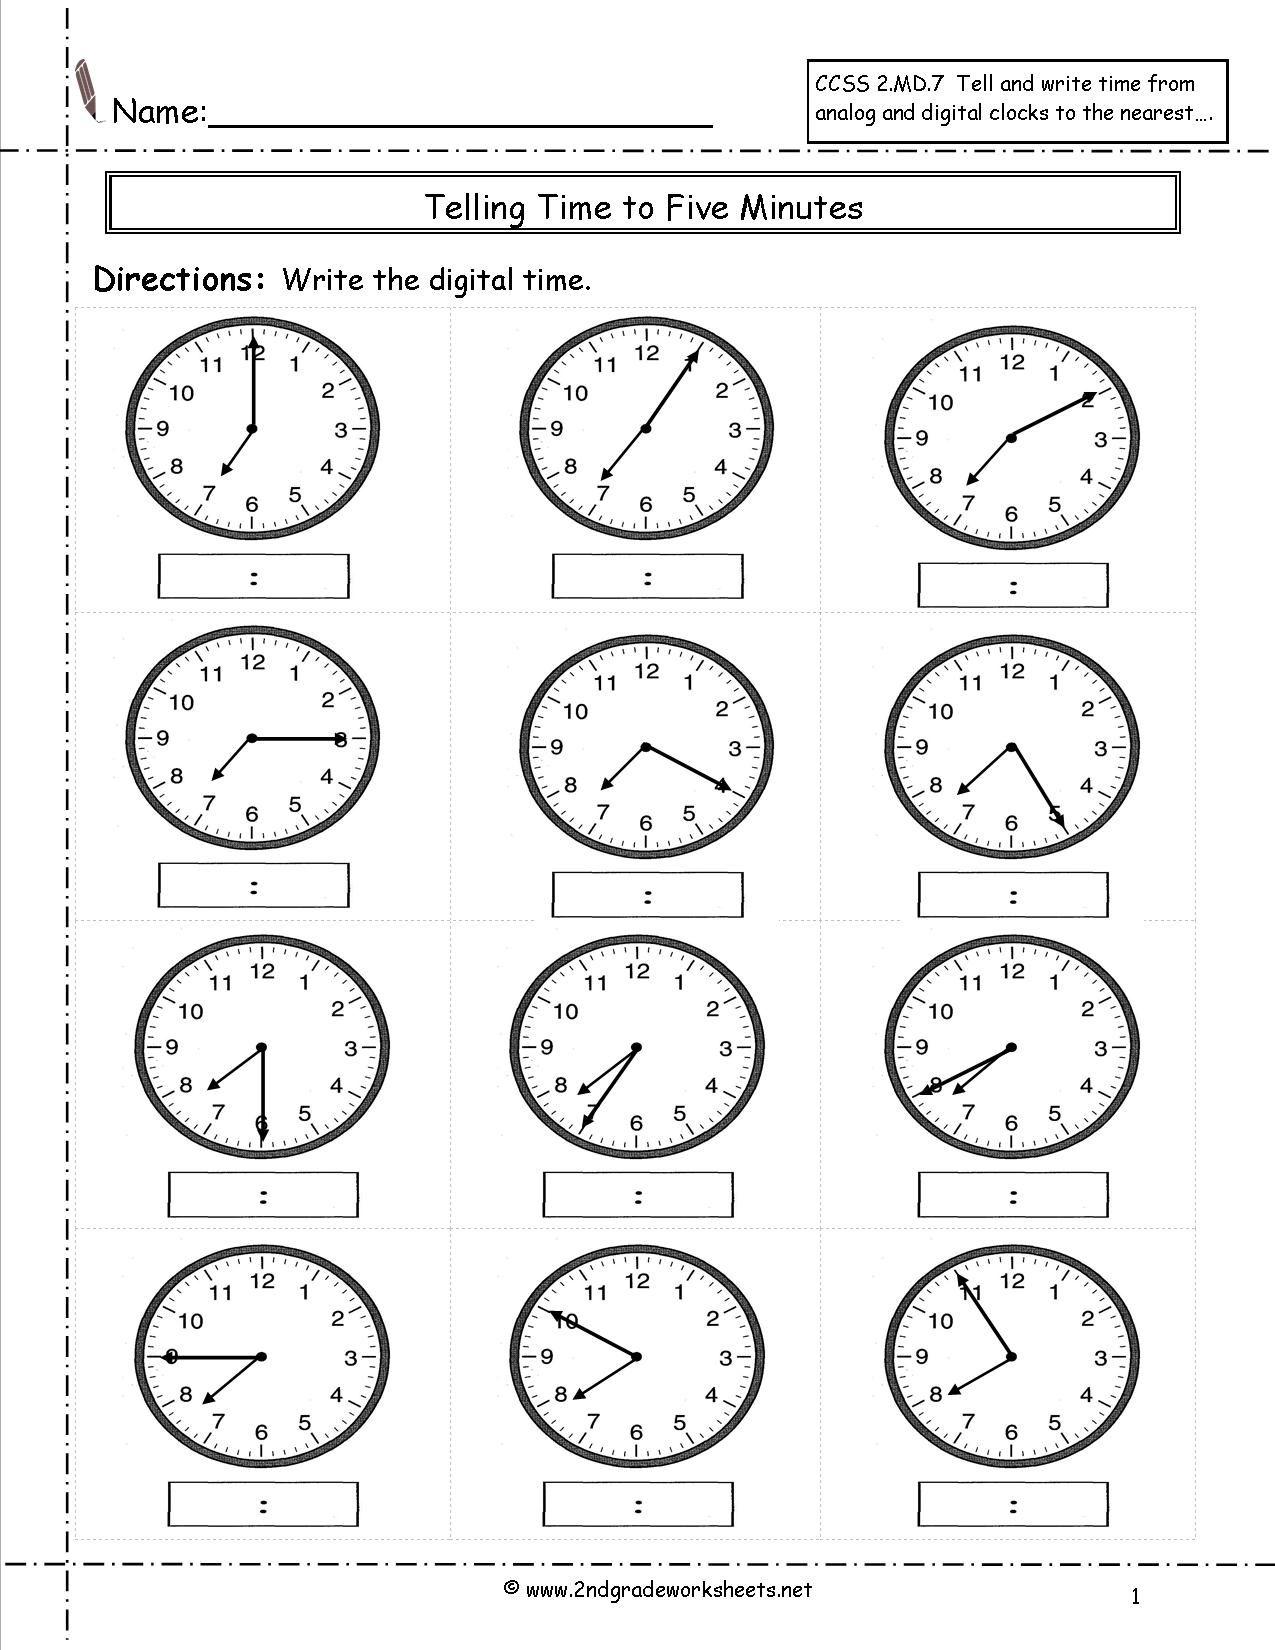 Telling Time Worksheets 3rd Grade   Time worksheets [ 1650 x 1275 Pixel ]